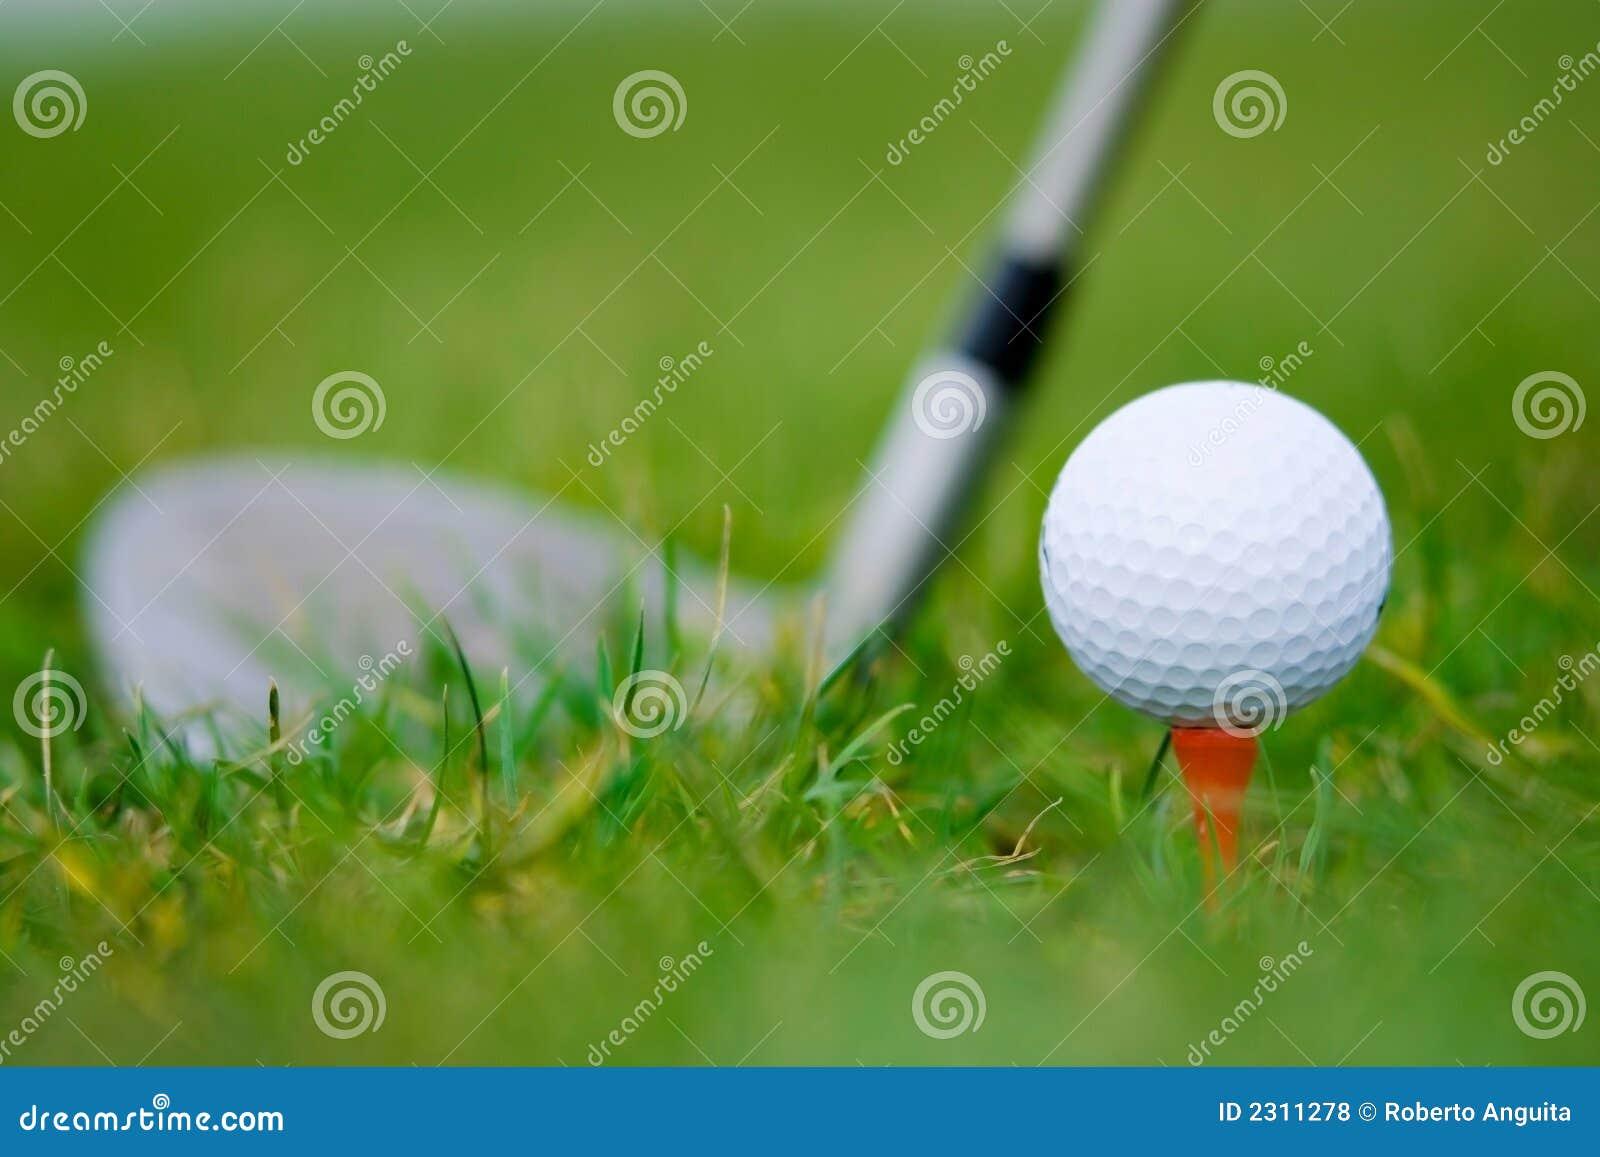 White ball golf